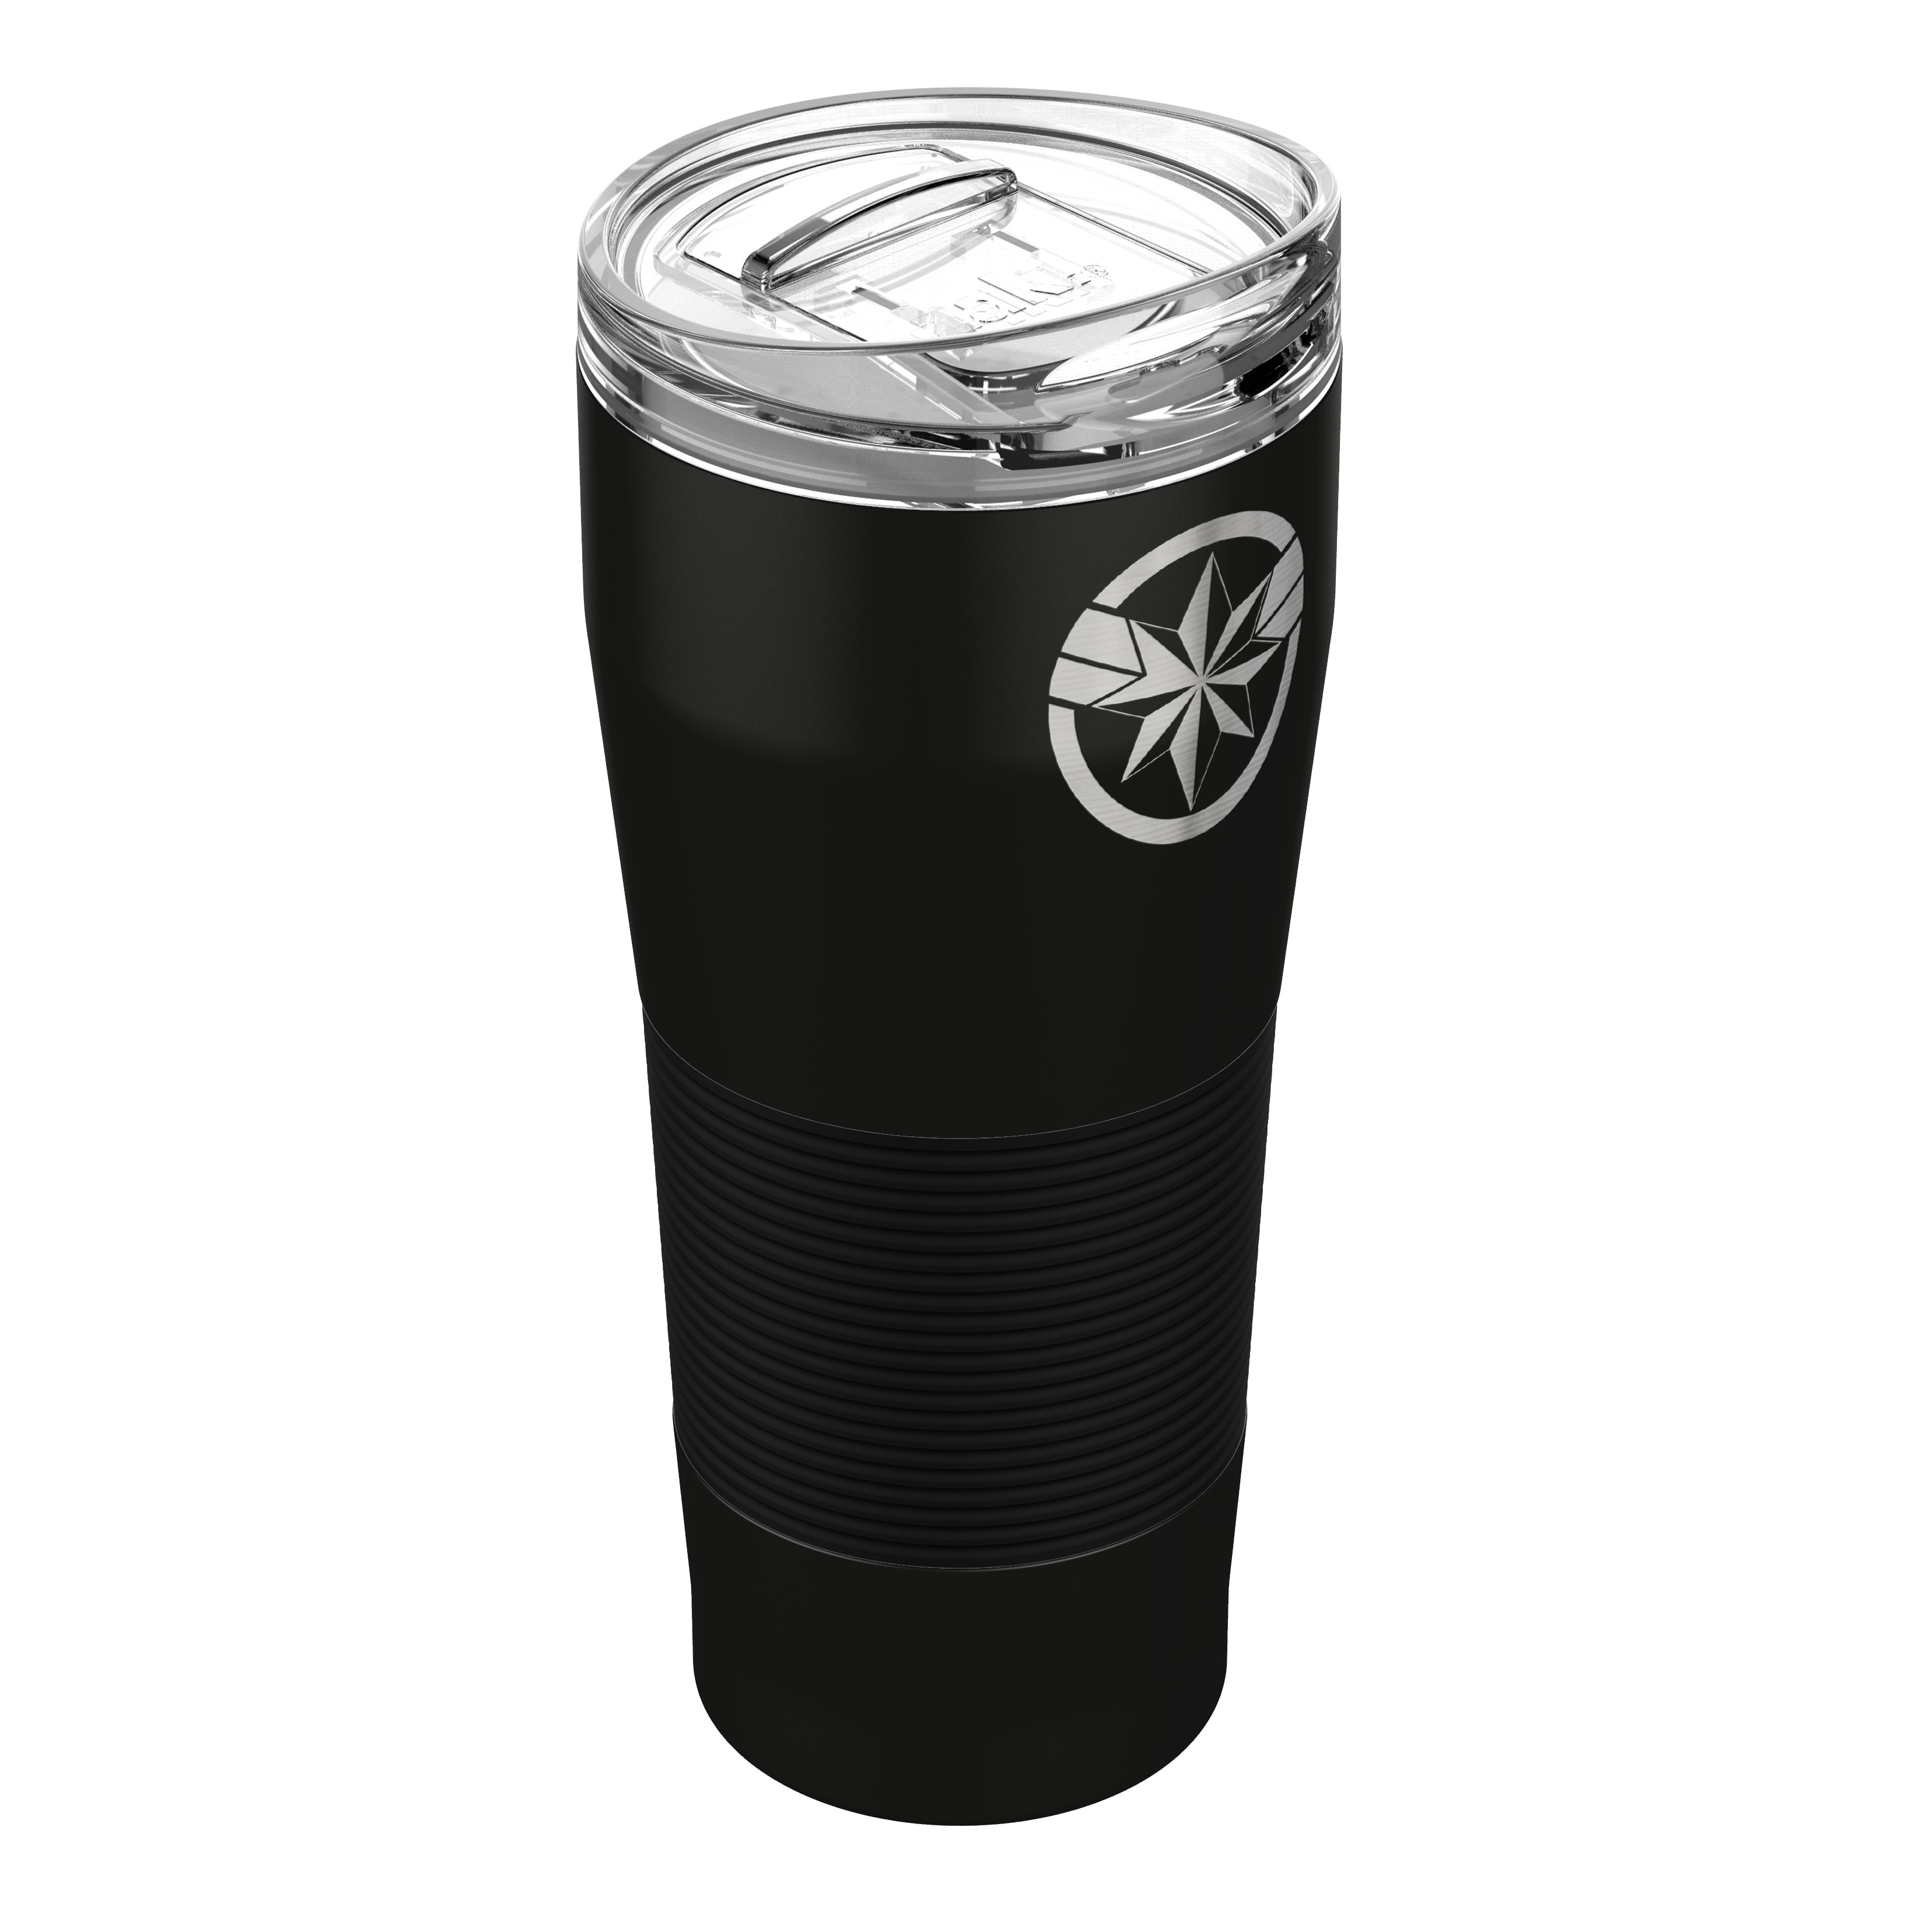 Marvel Comics 28 ounce Vacuum Insulated Stainless Steel Tumbler, Captain Marvel slideshow image 4